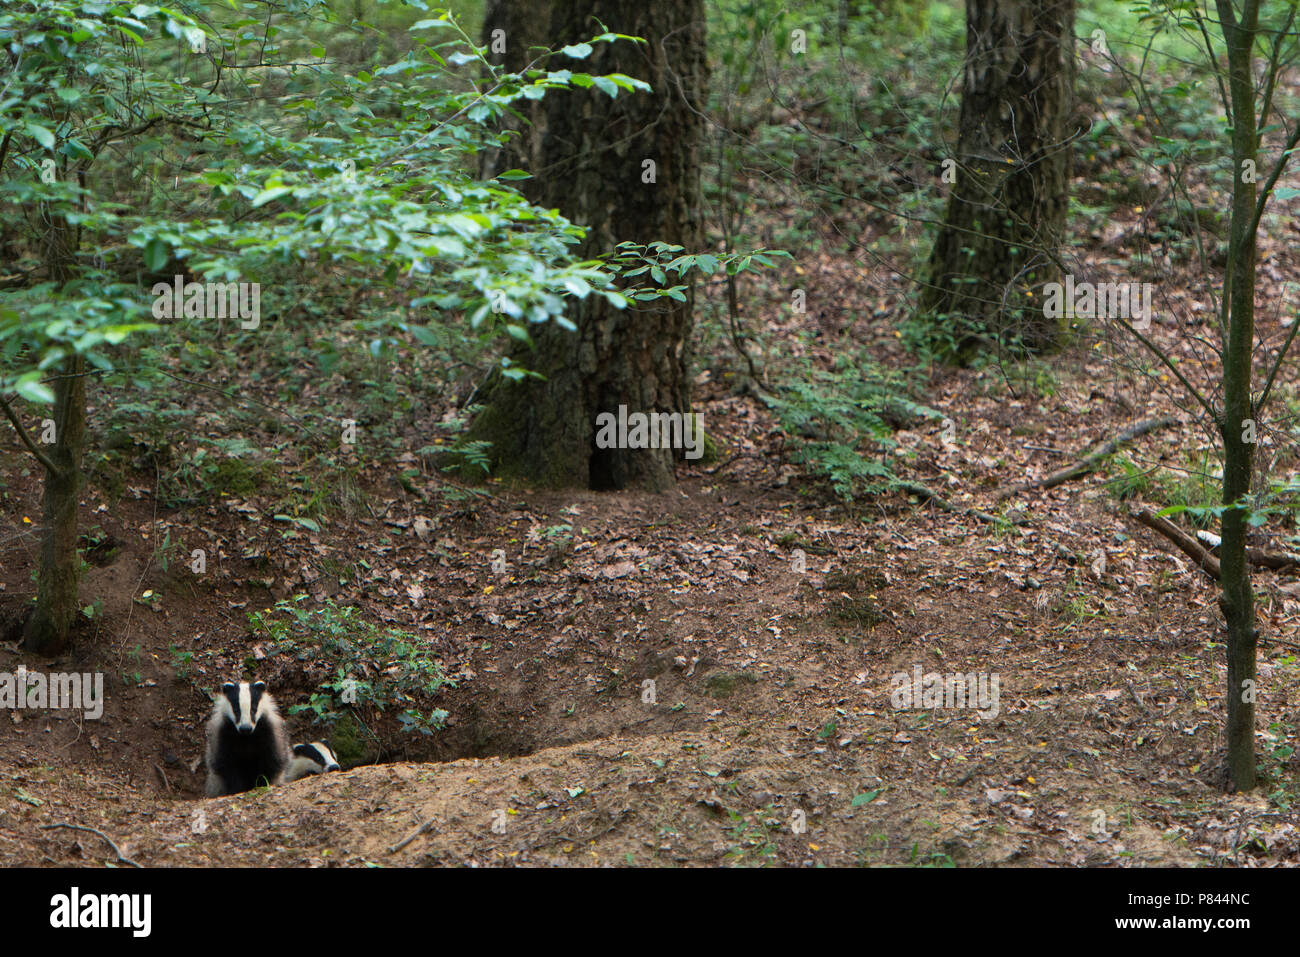 Dassen rond burcht,  European Badger near hole - Stock Image